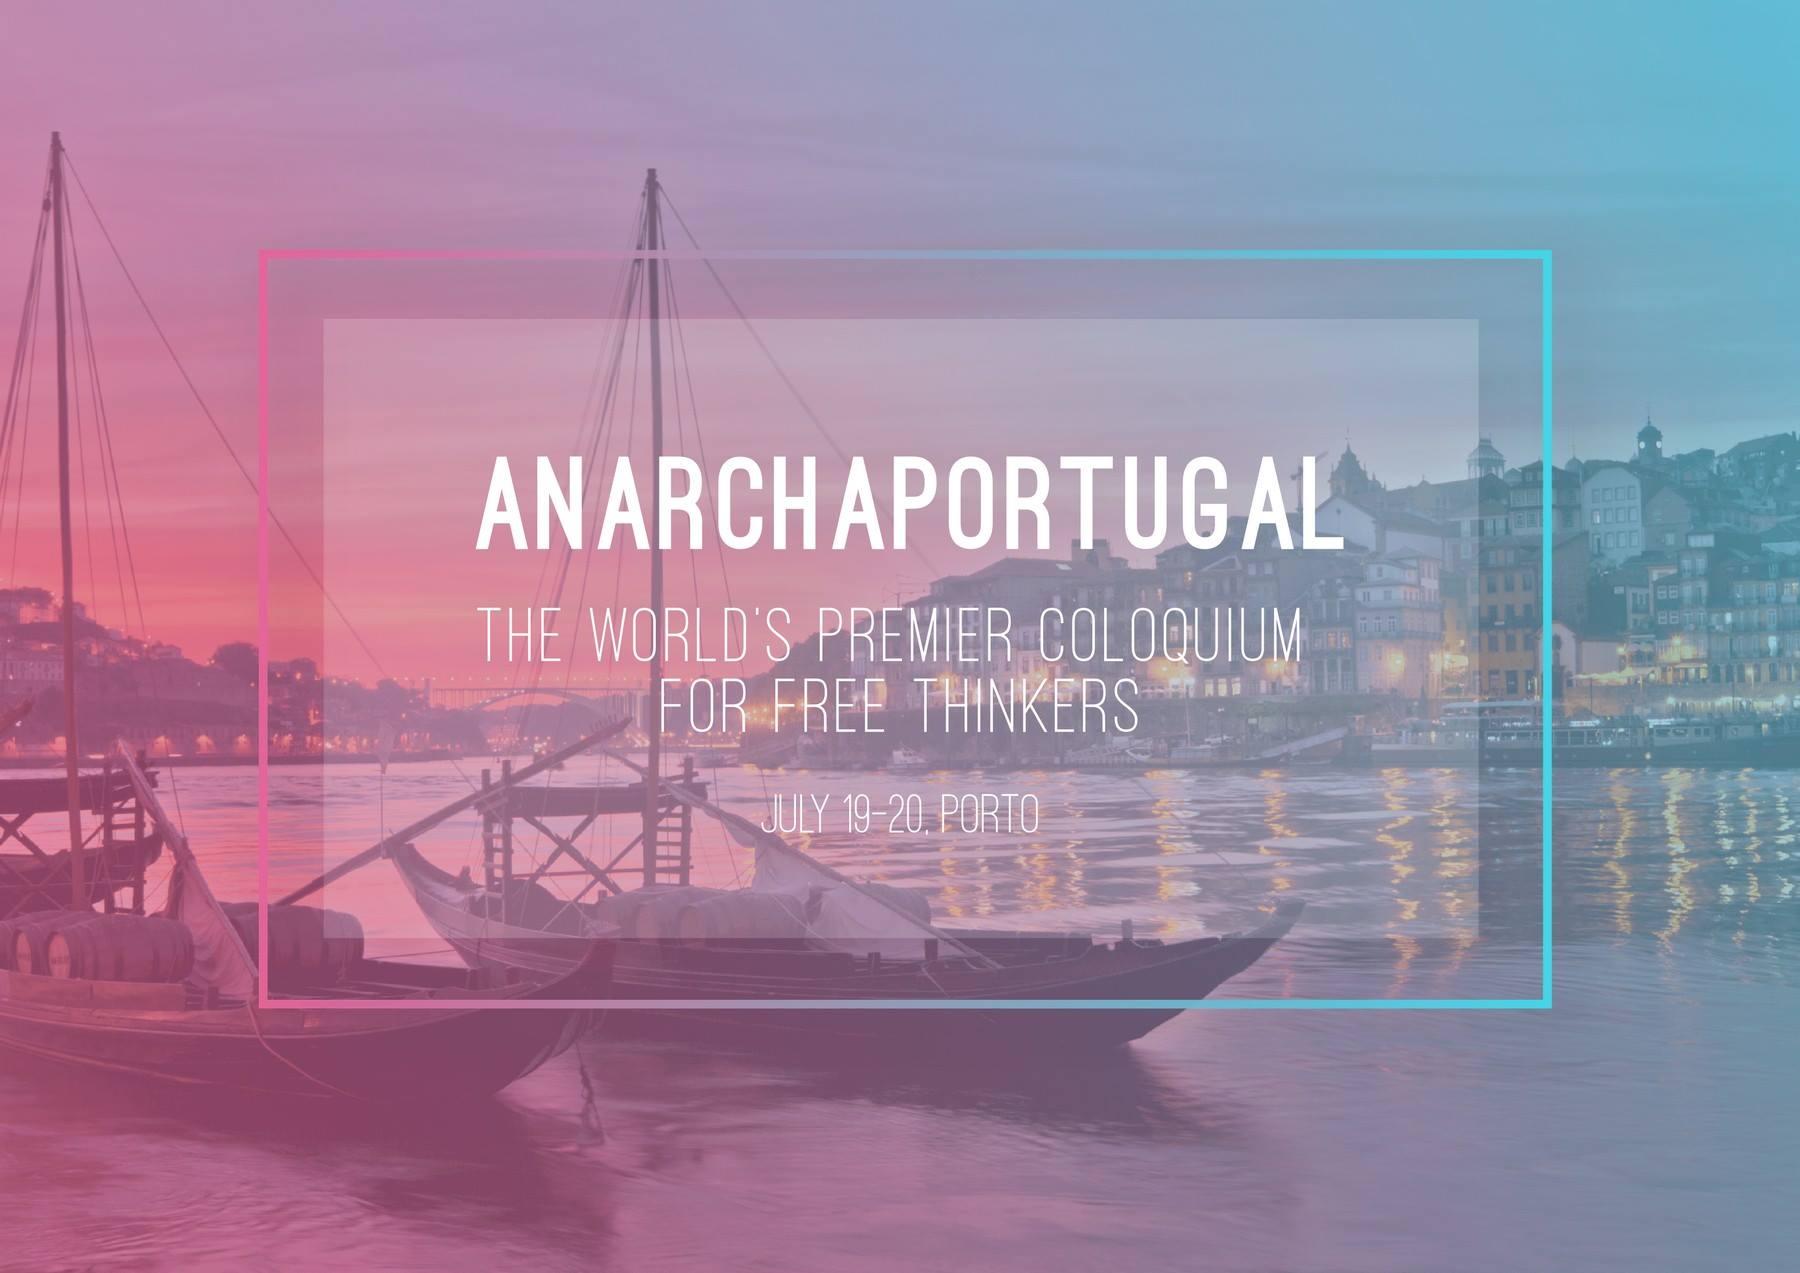 anarchaportugal